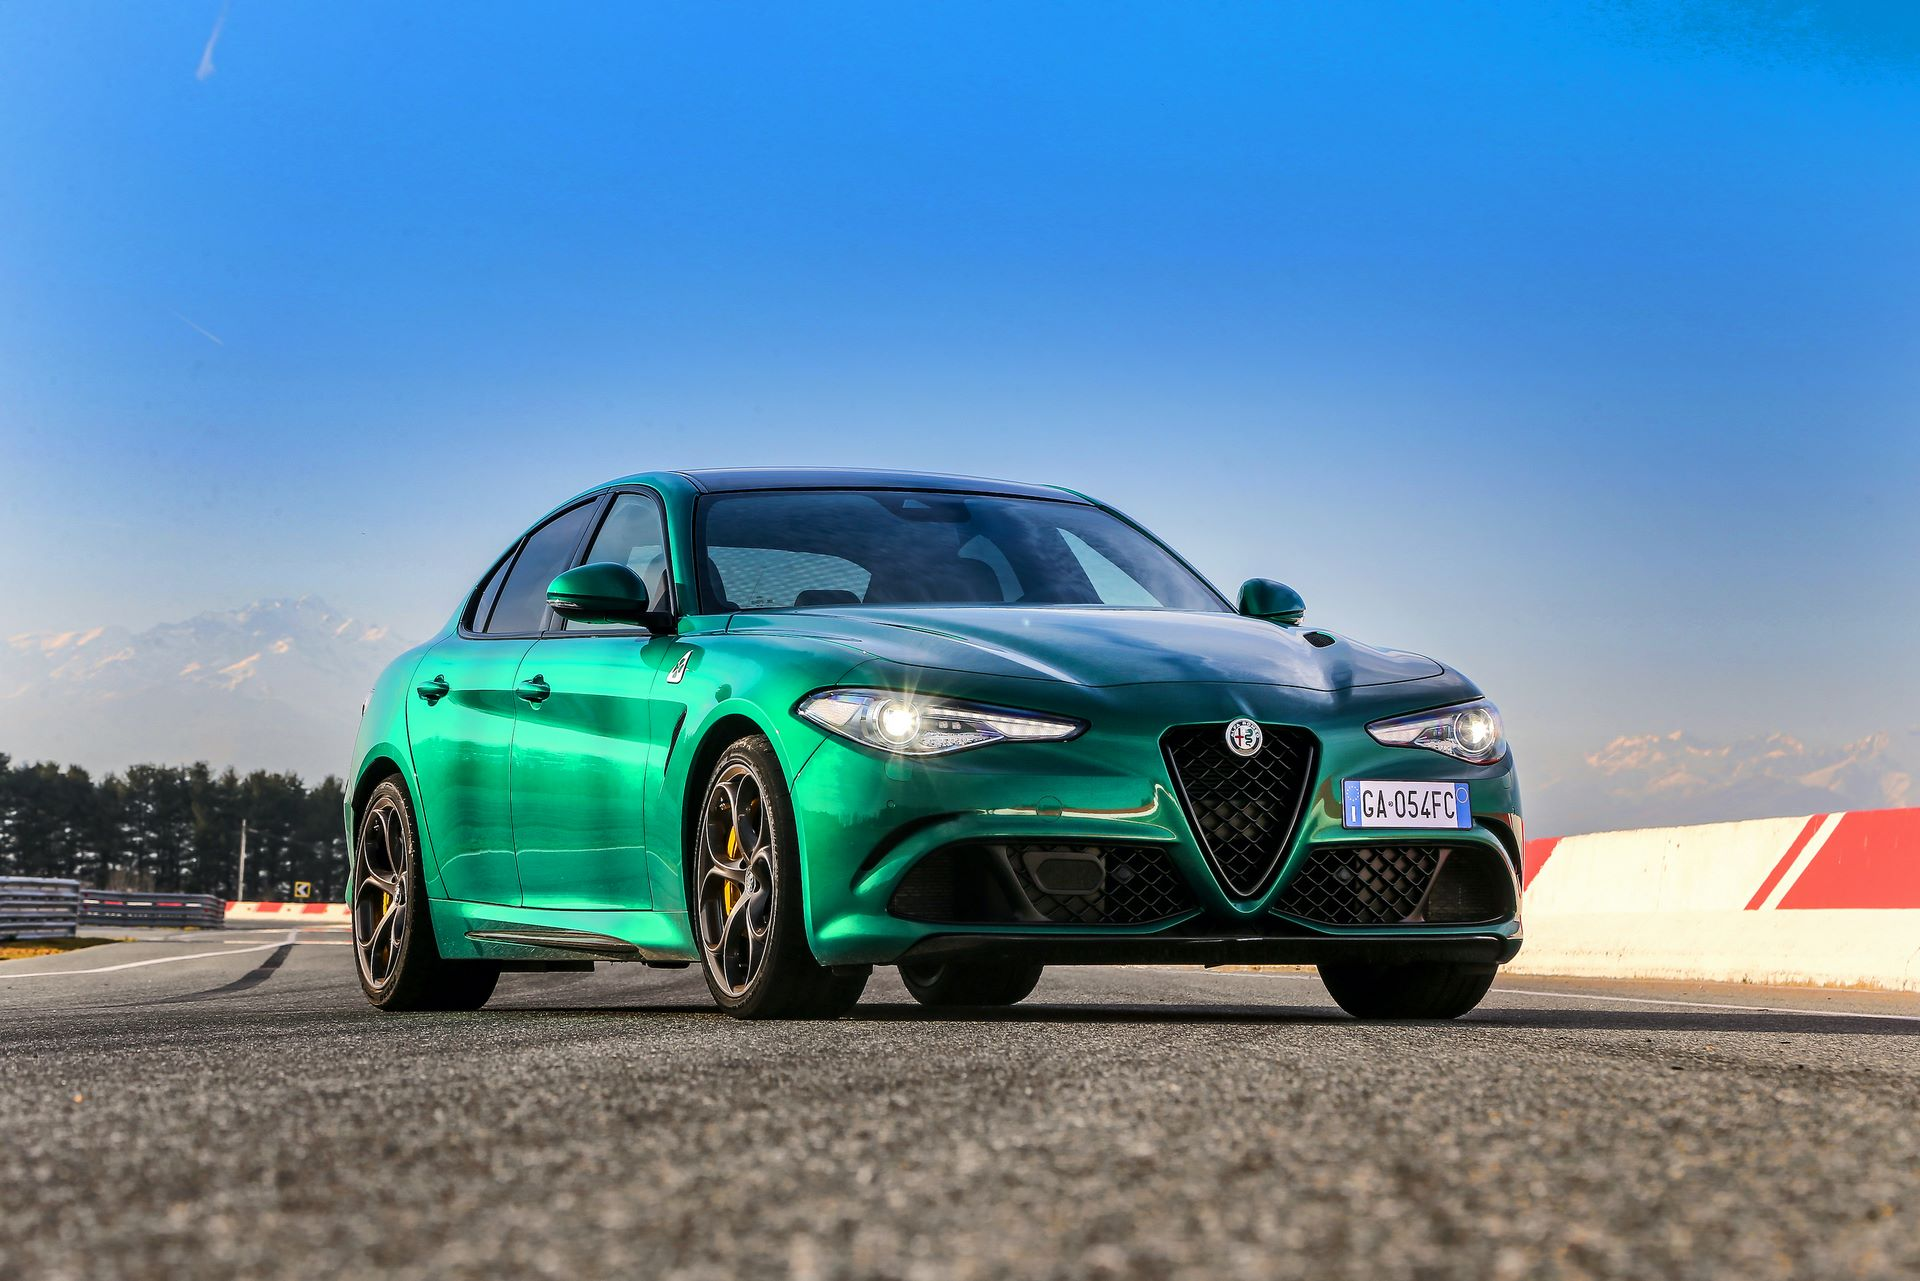 Alfa-Romeo-Giulia-Quadrifoglio-Stelvio-Quadrifoglio-facelift-2020-18